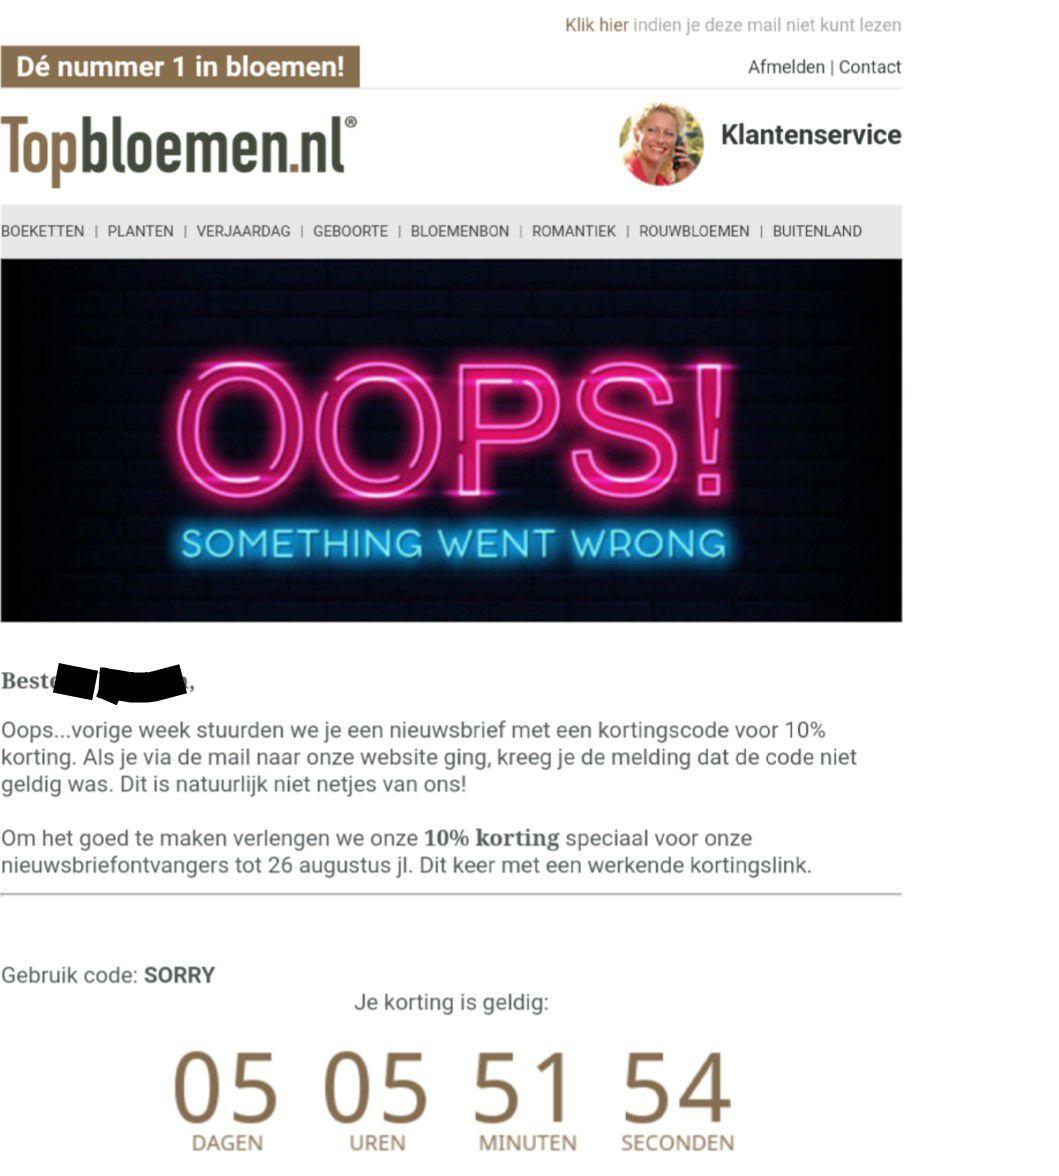 10% korting @ topbloemen.nl